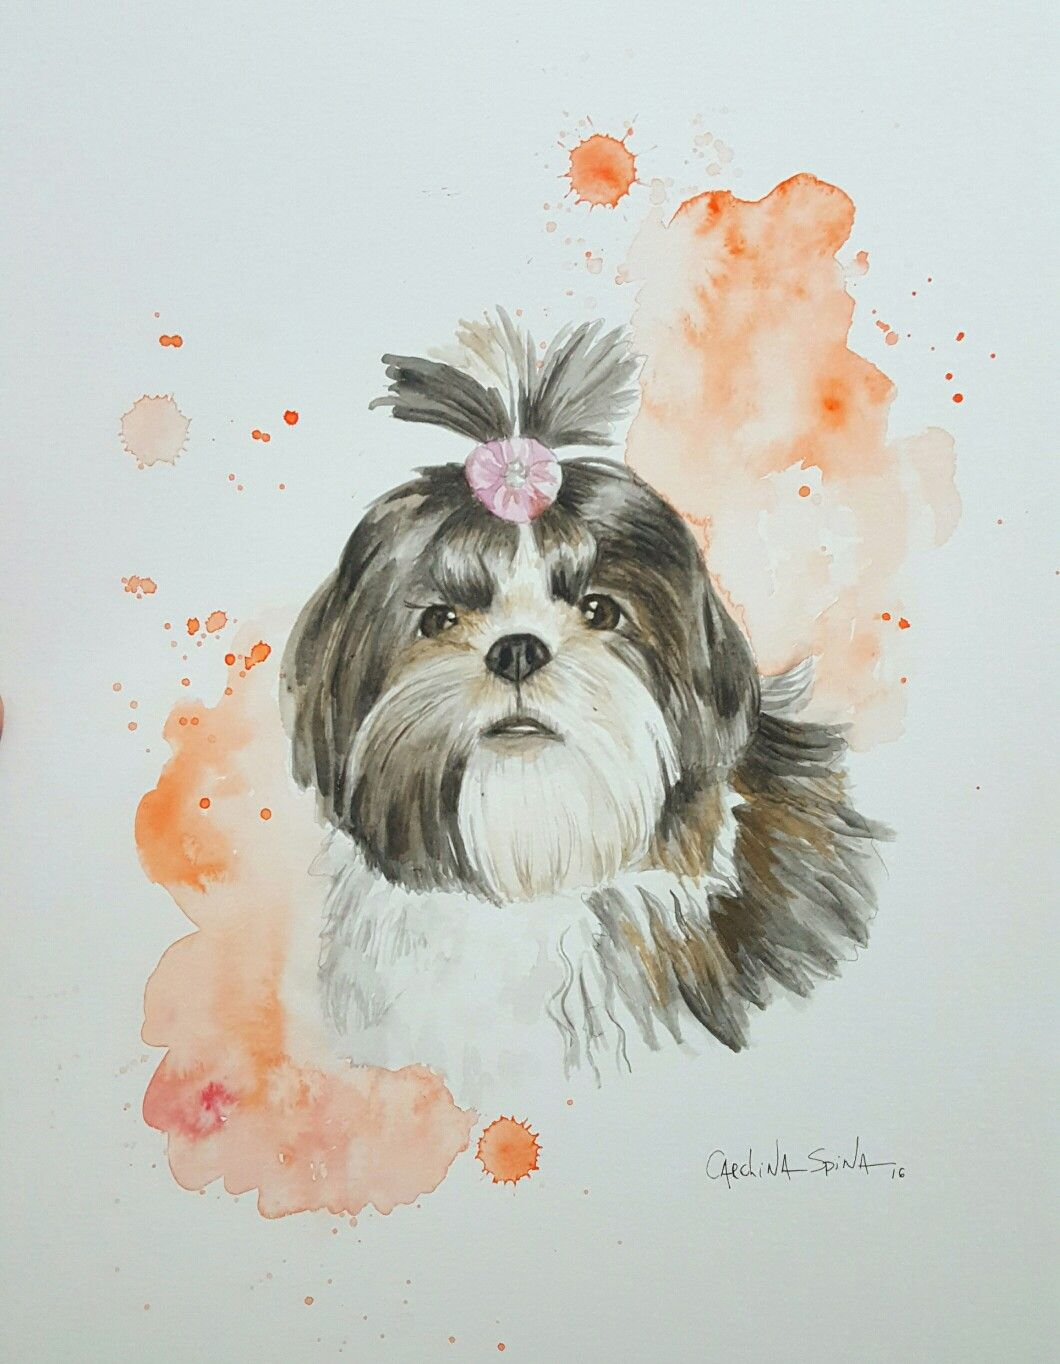 Shih Tzu Watercolor Pet Portraits Retratos De Pet Em Aquarela Por